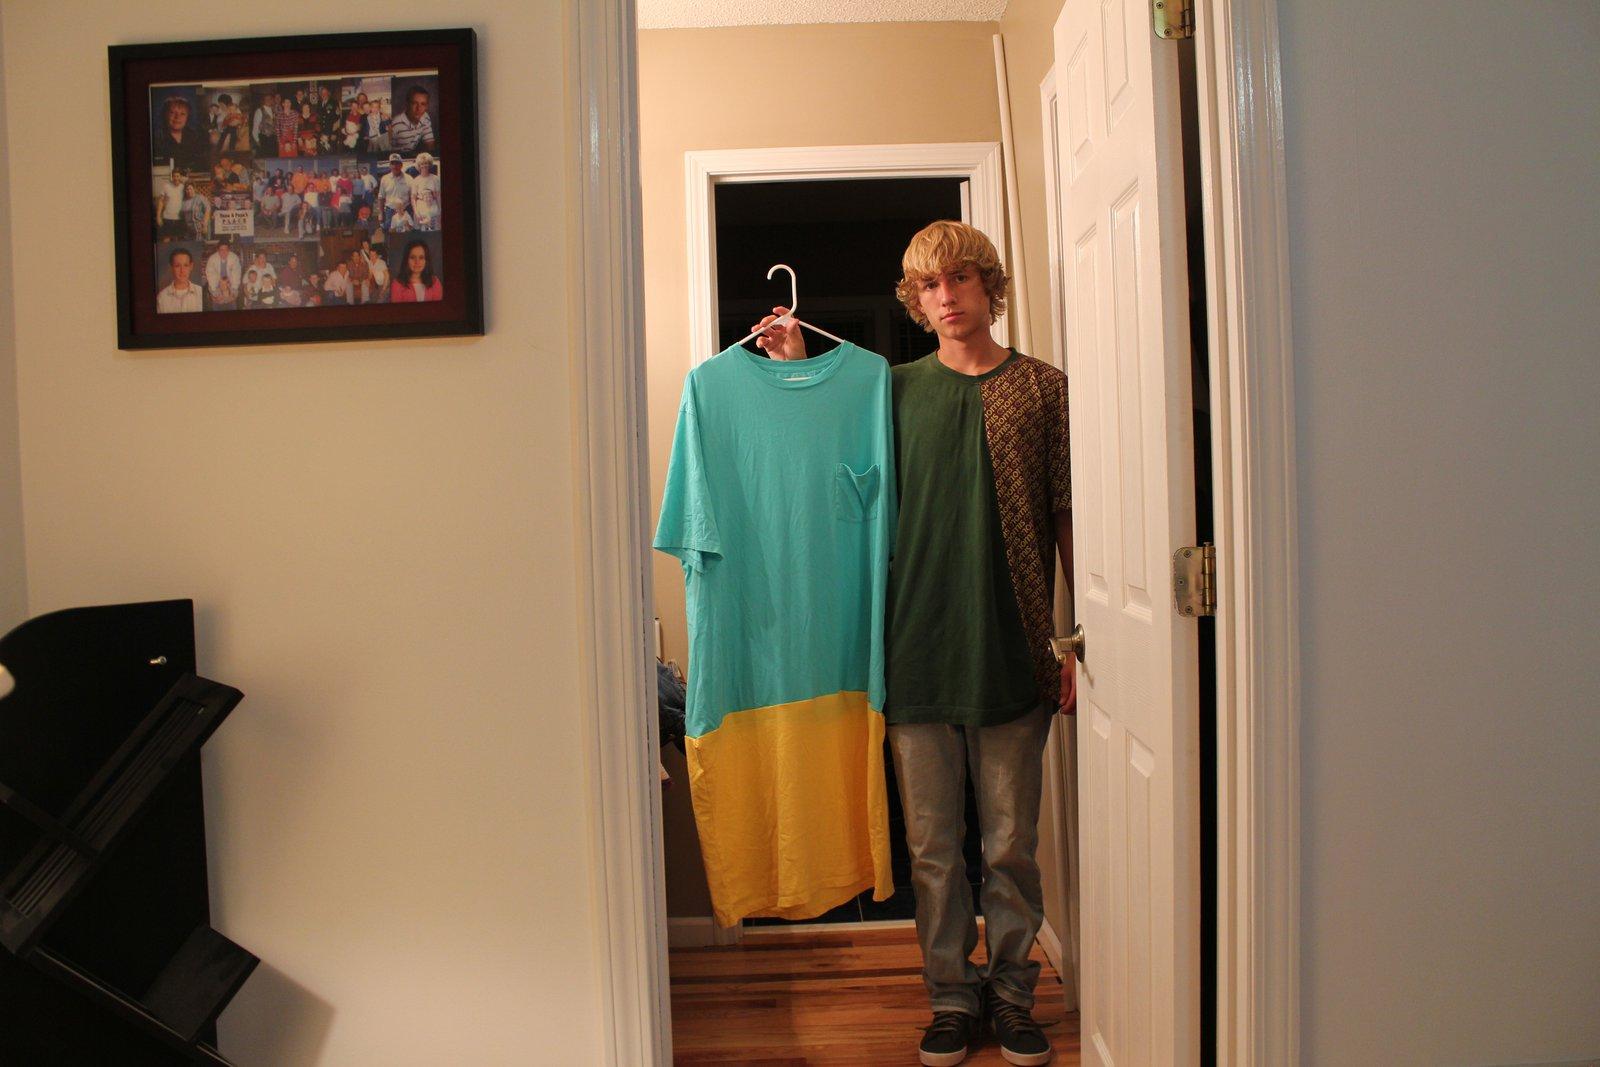 big ass shirt